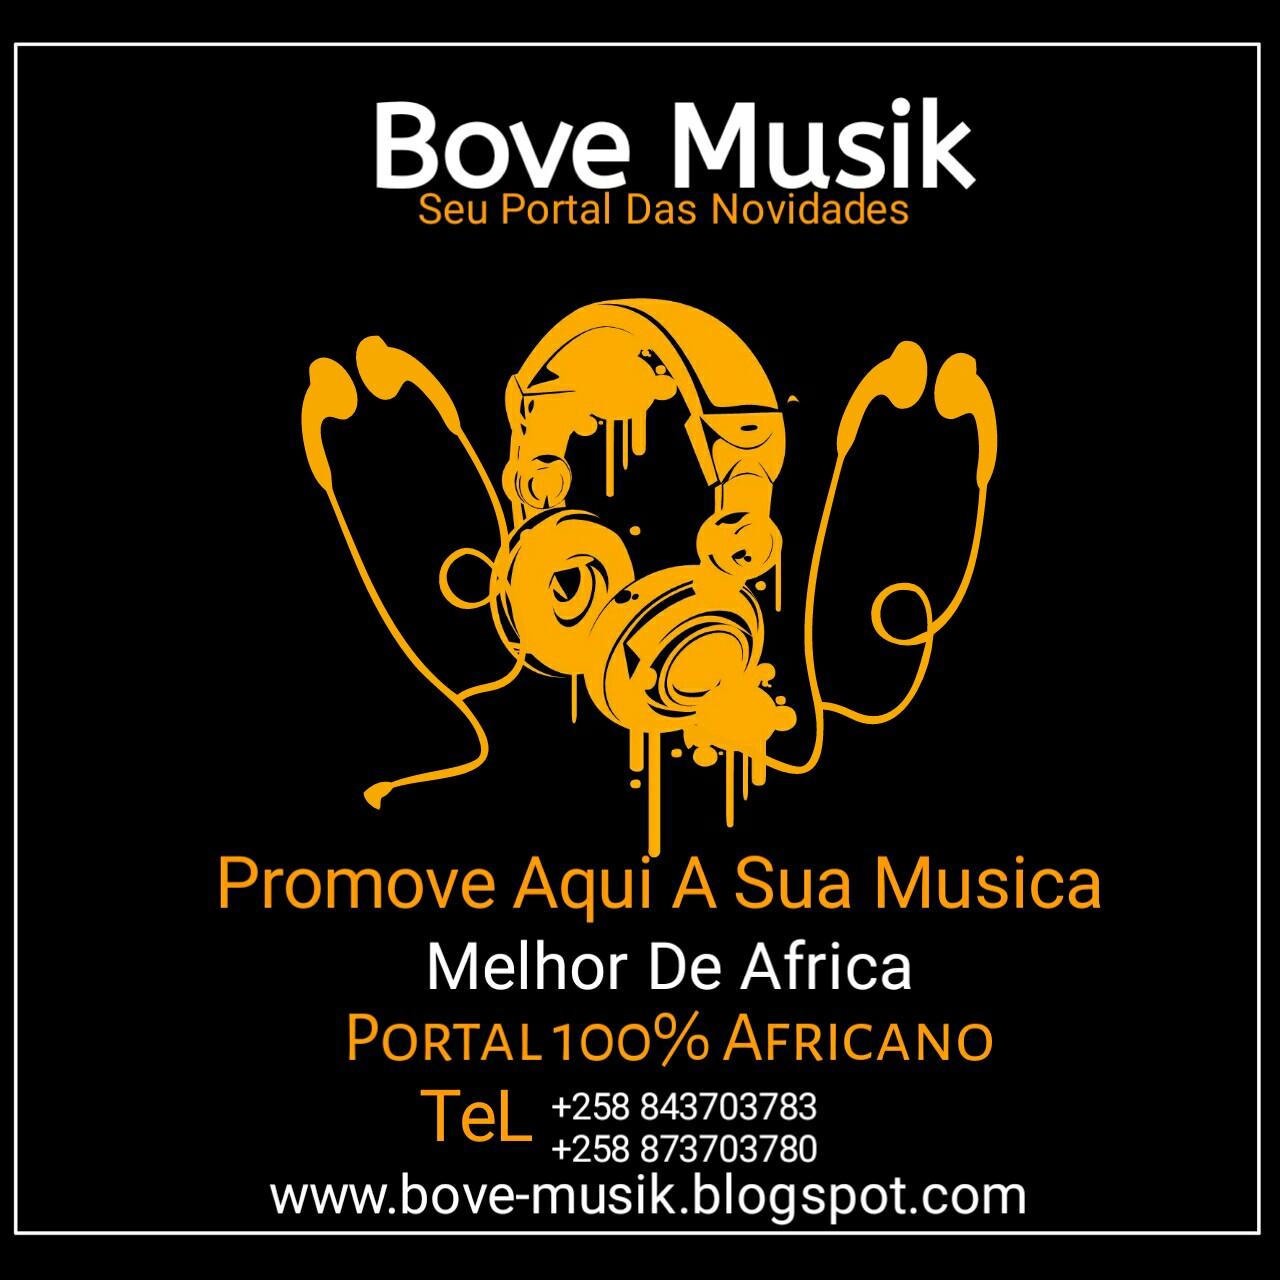 Messias Maricoa-Eu estava Ai[mp3] - Bove Musik